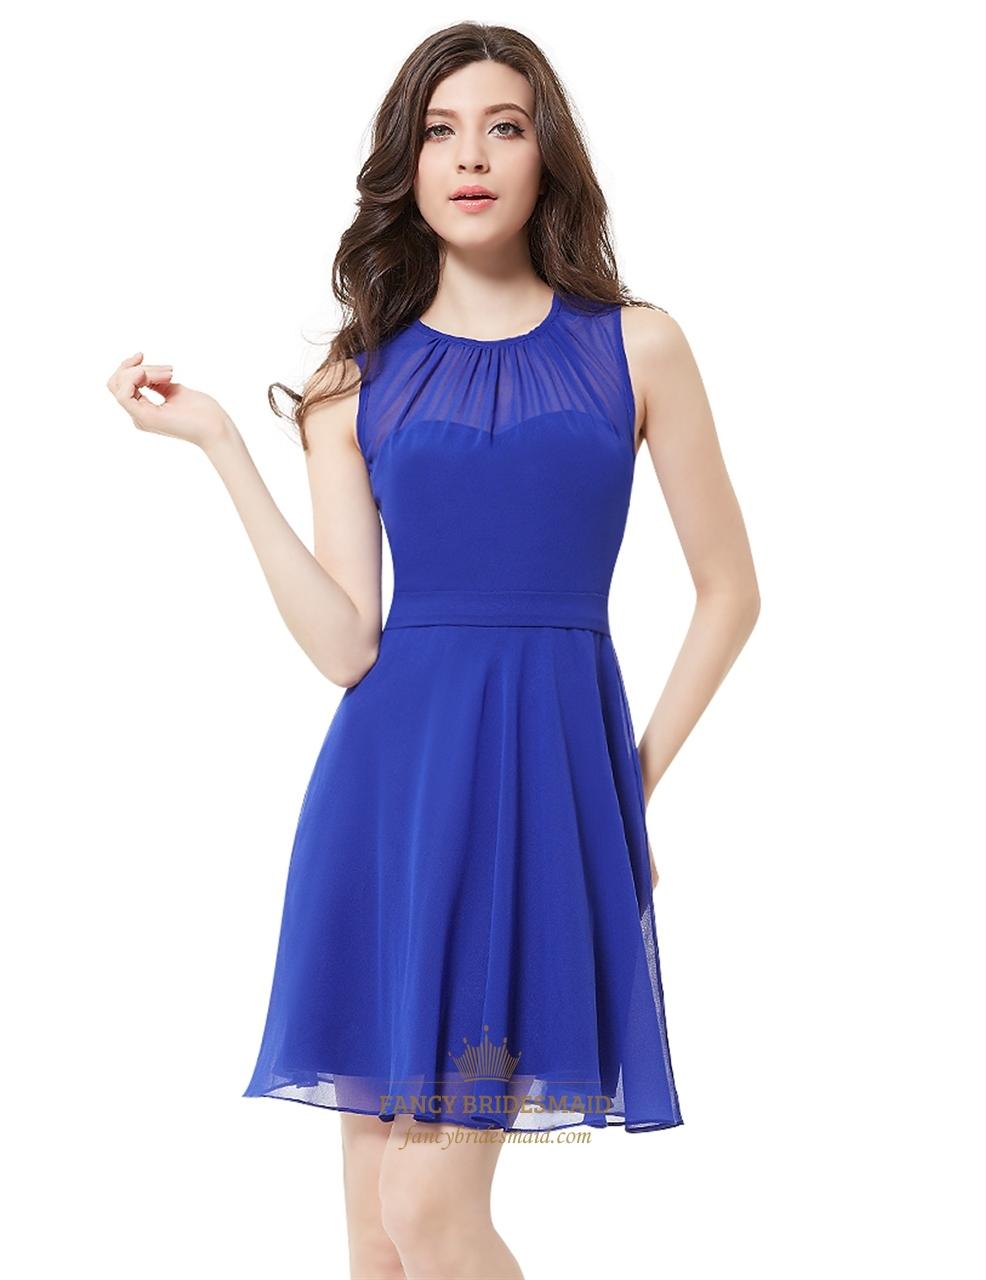 Elegant royal blue illusion neckline chiffon short bridesmaid elegant royal blue illusion neckline chiffon short bridesmaid dresses ombrellifo Choice Image